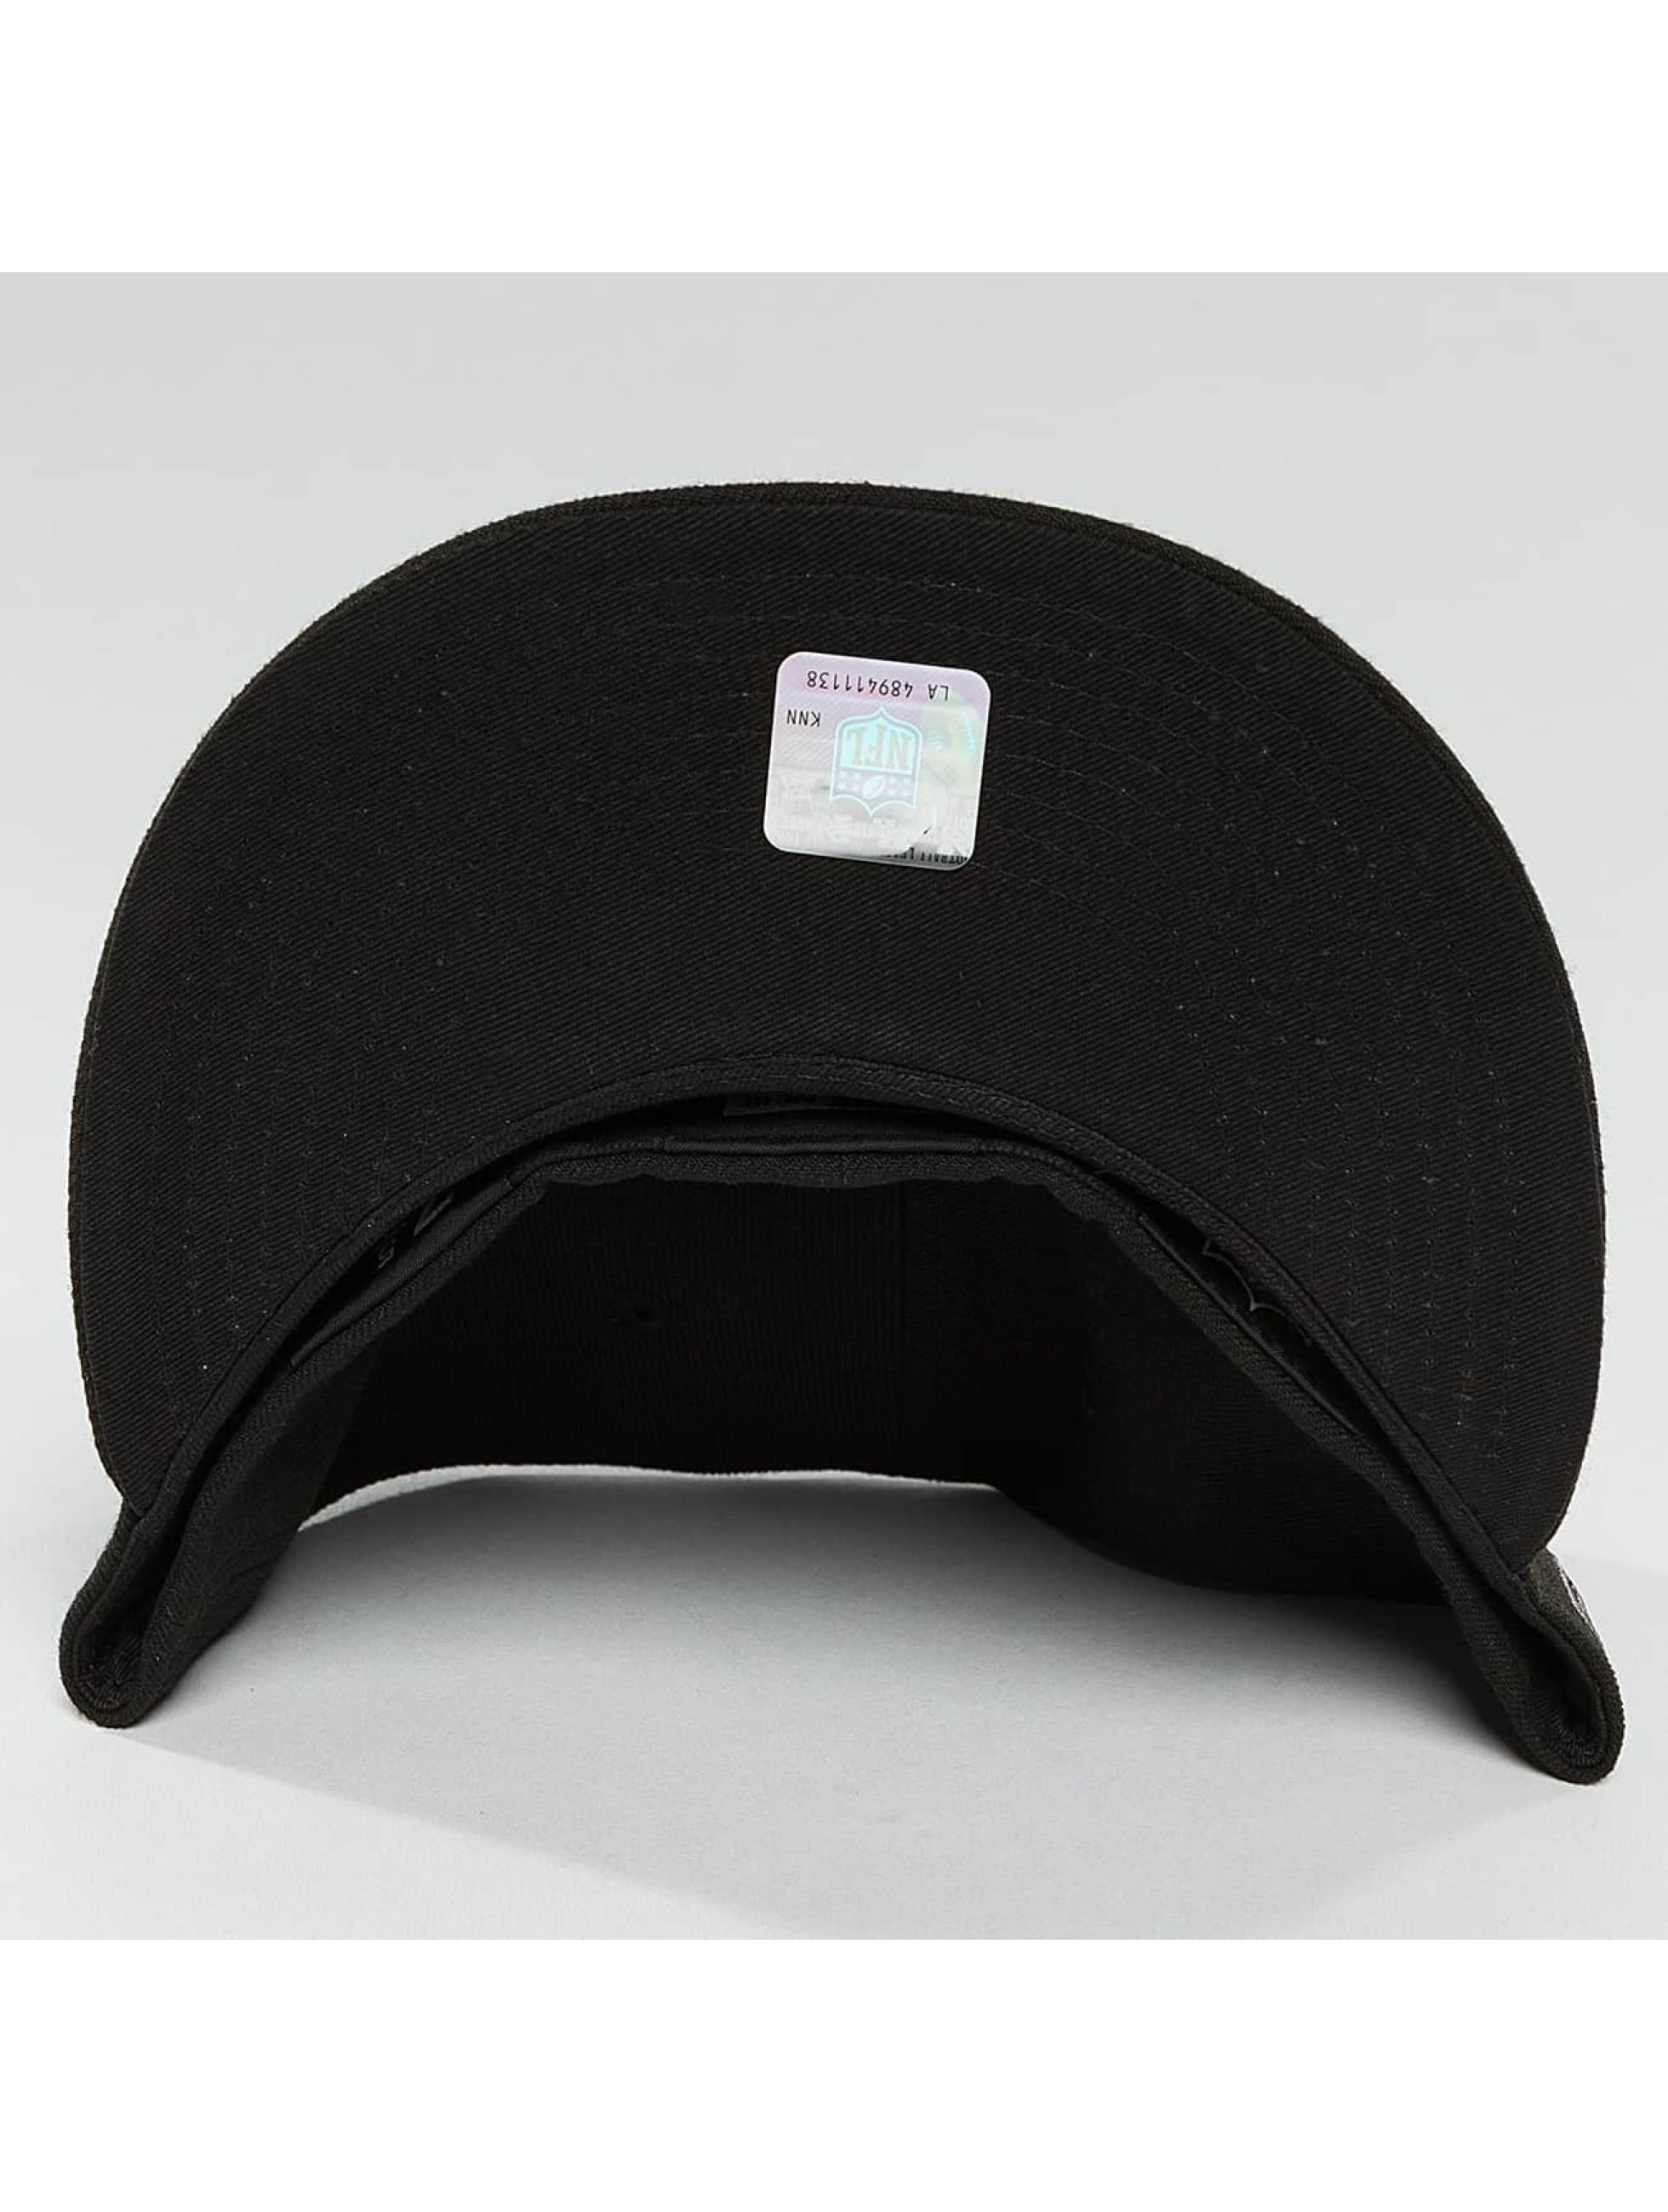 New Era Fitted Cap Black Graphite Carolina Panthers 59Fifty zwart